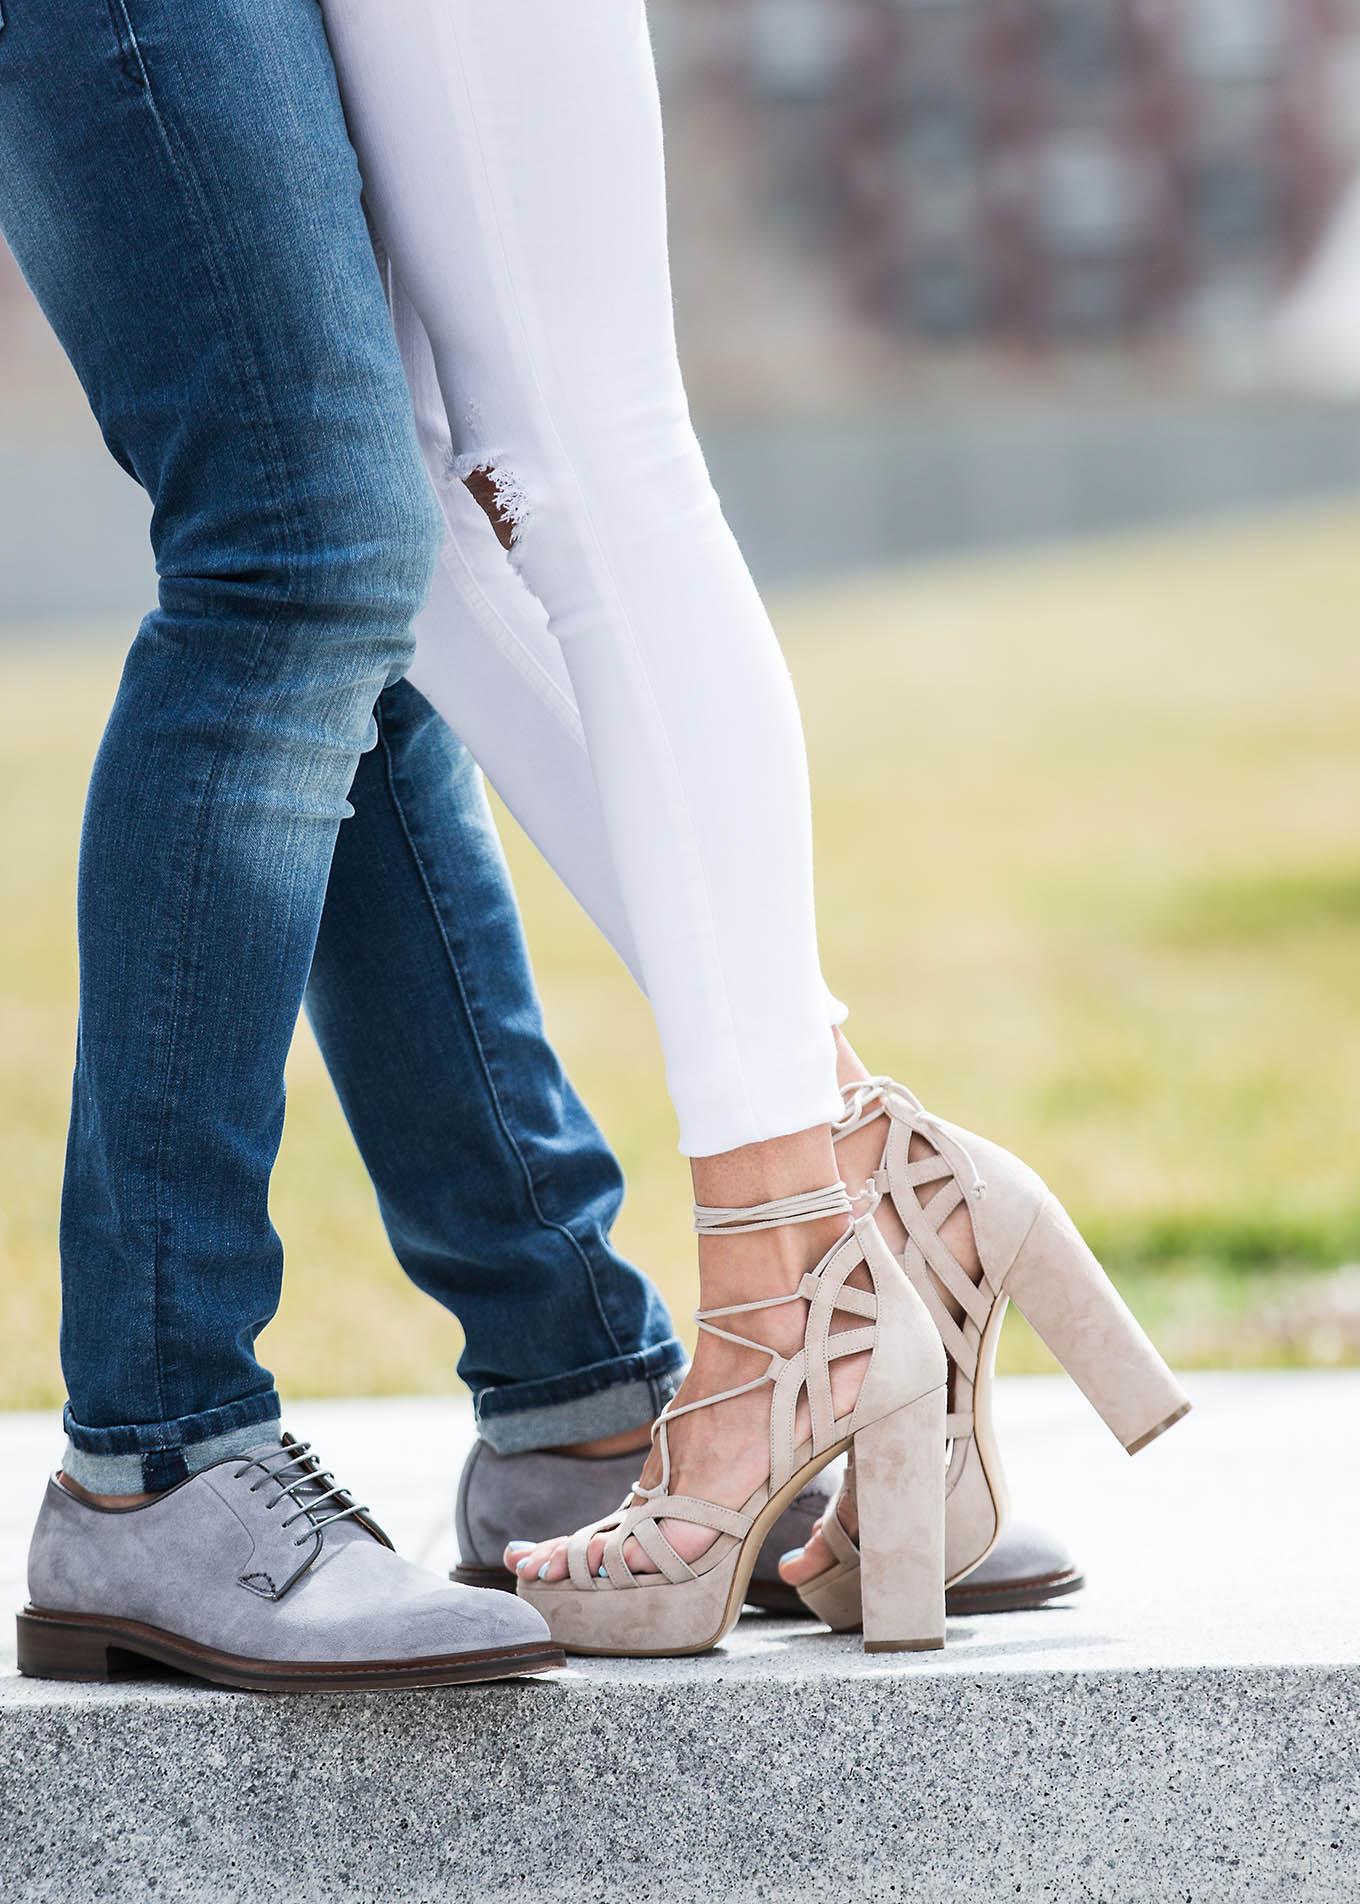 M.Gemi heeled sandals